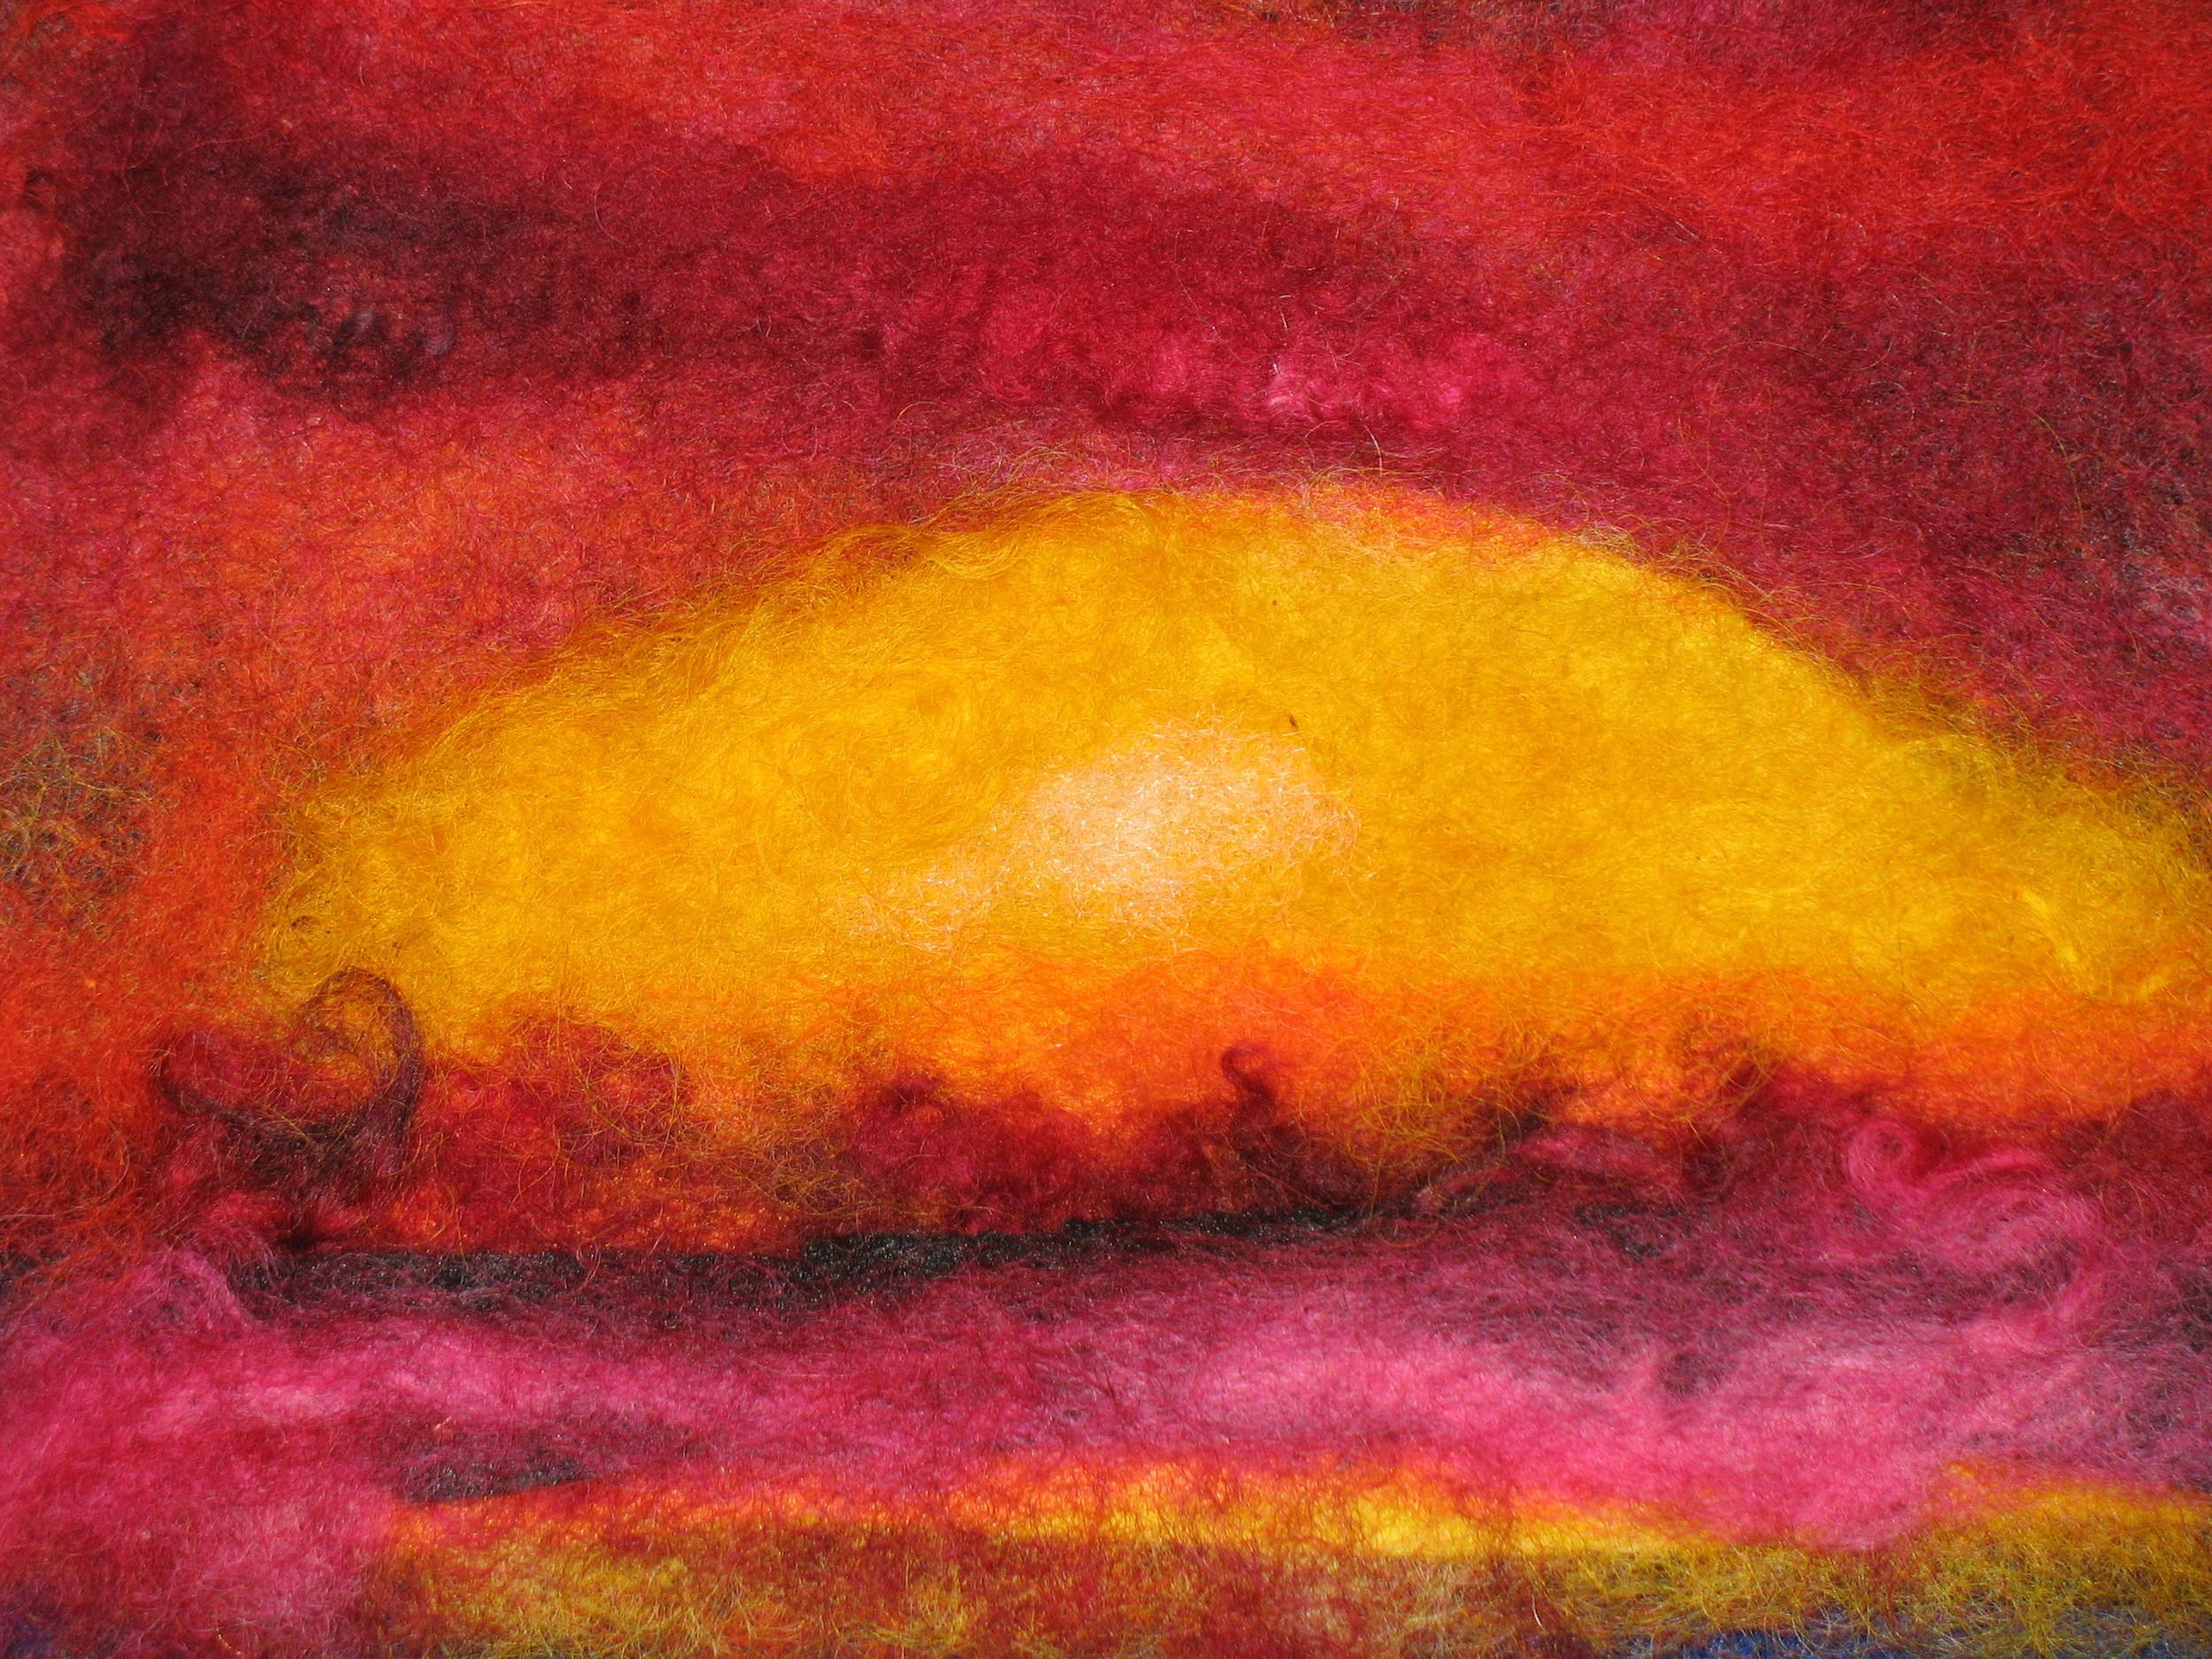 Sun Ra. Rest In Action. #2 (c) Kaitha Het Heru. 5 X 7 inches. 100% Wool Roving. Needle Felting